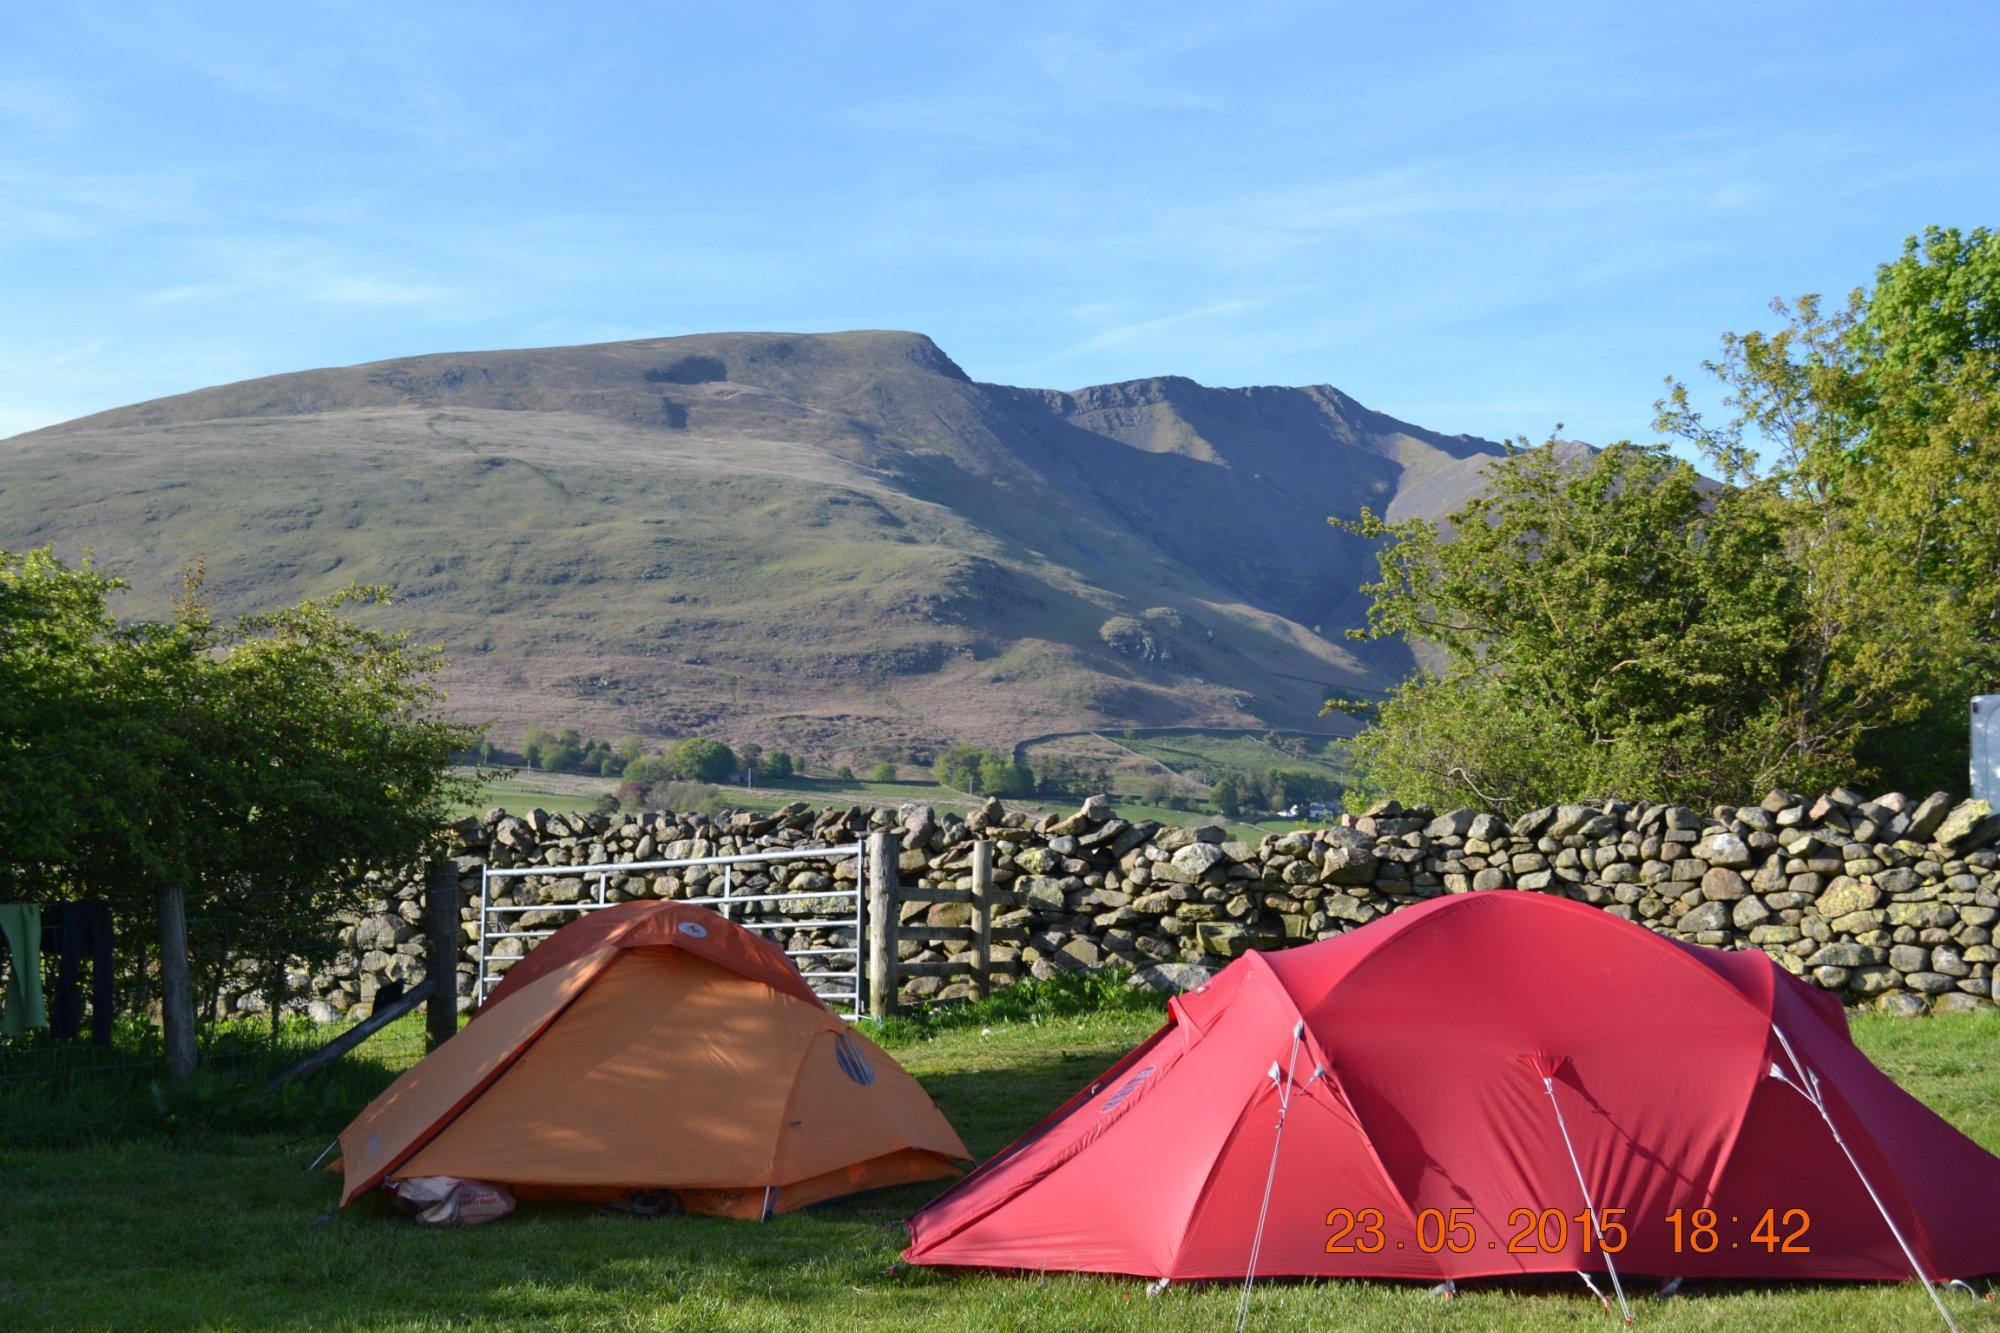 Burns Farm Caravan & Campsite